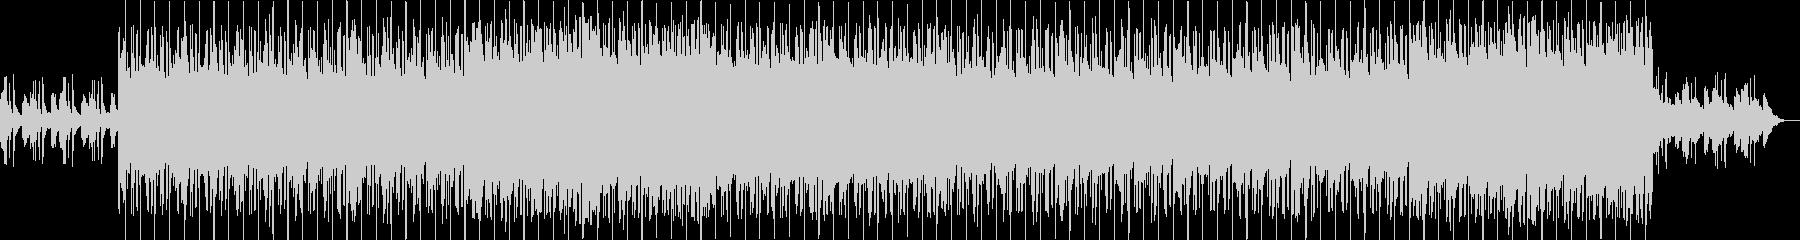 bpm116-メロウなギターVoのEDMの未再生の波形